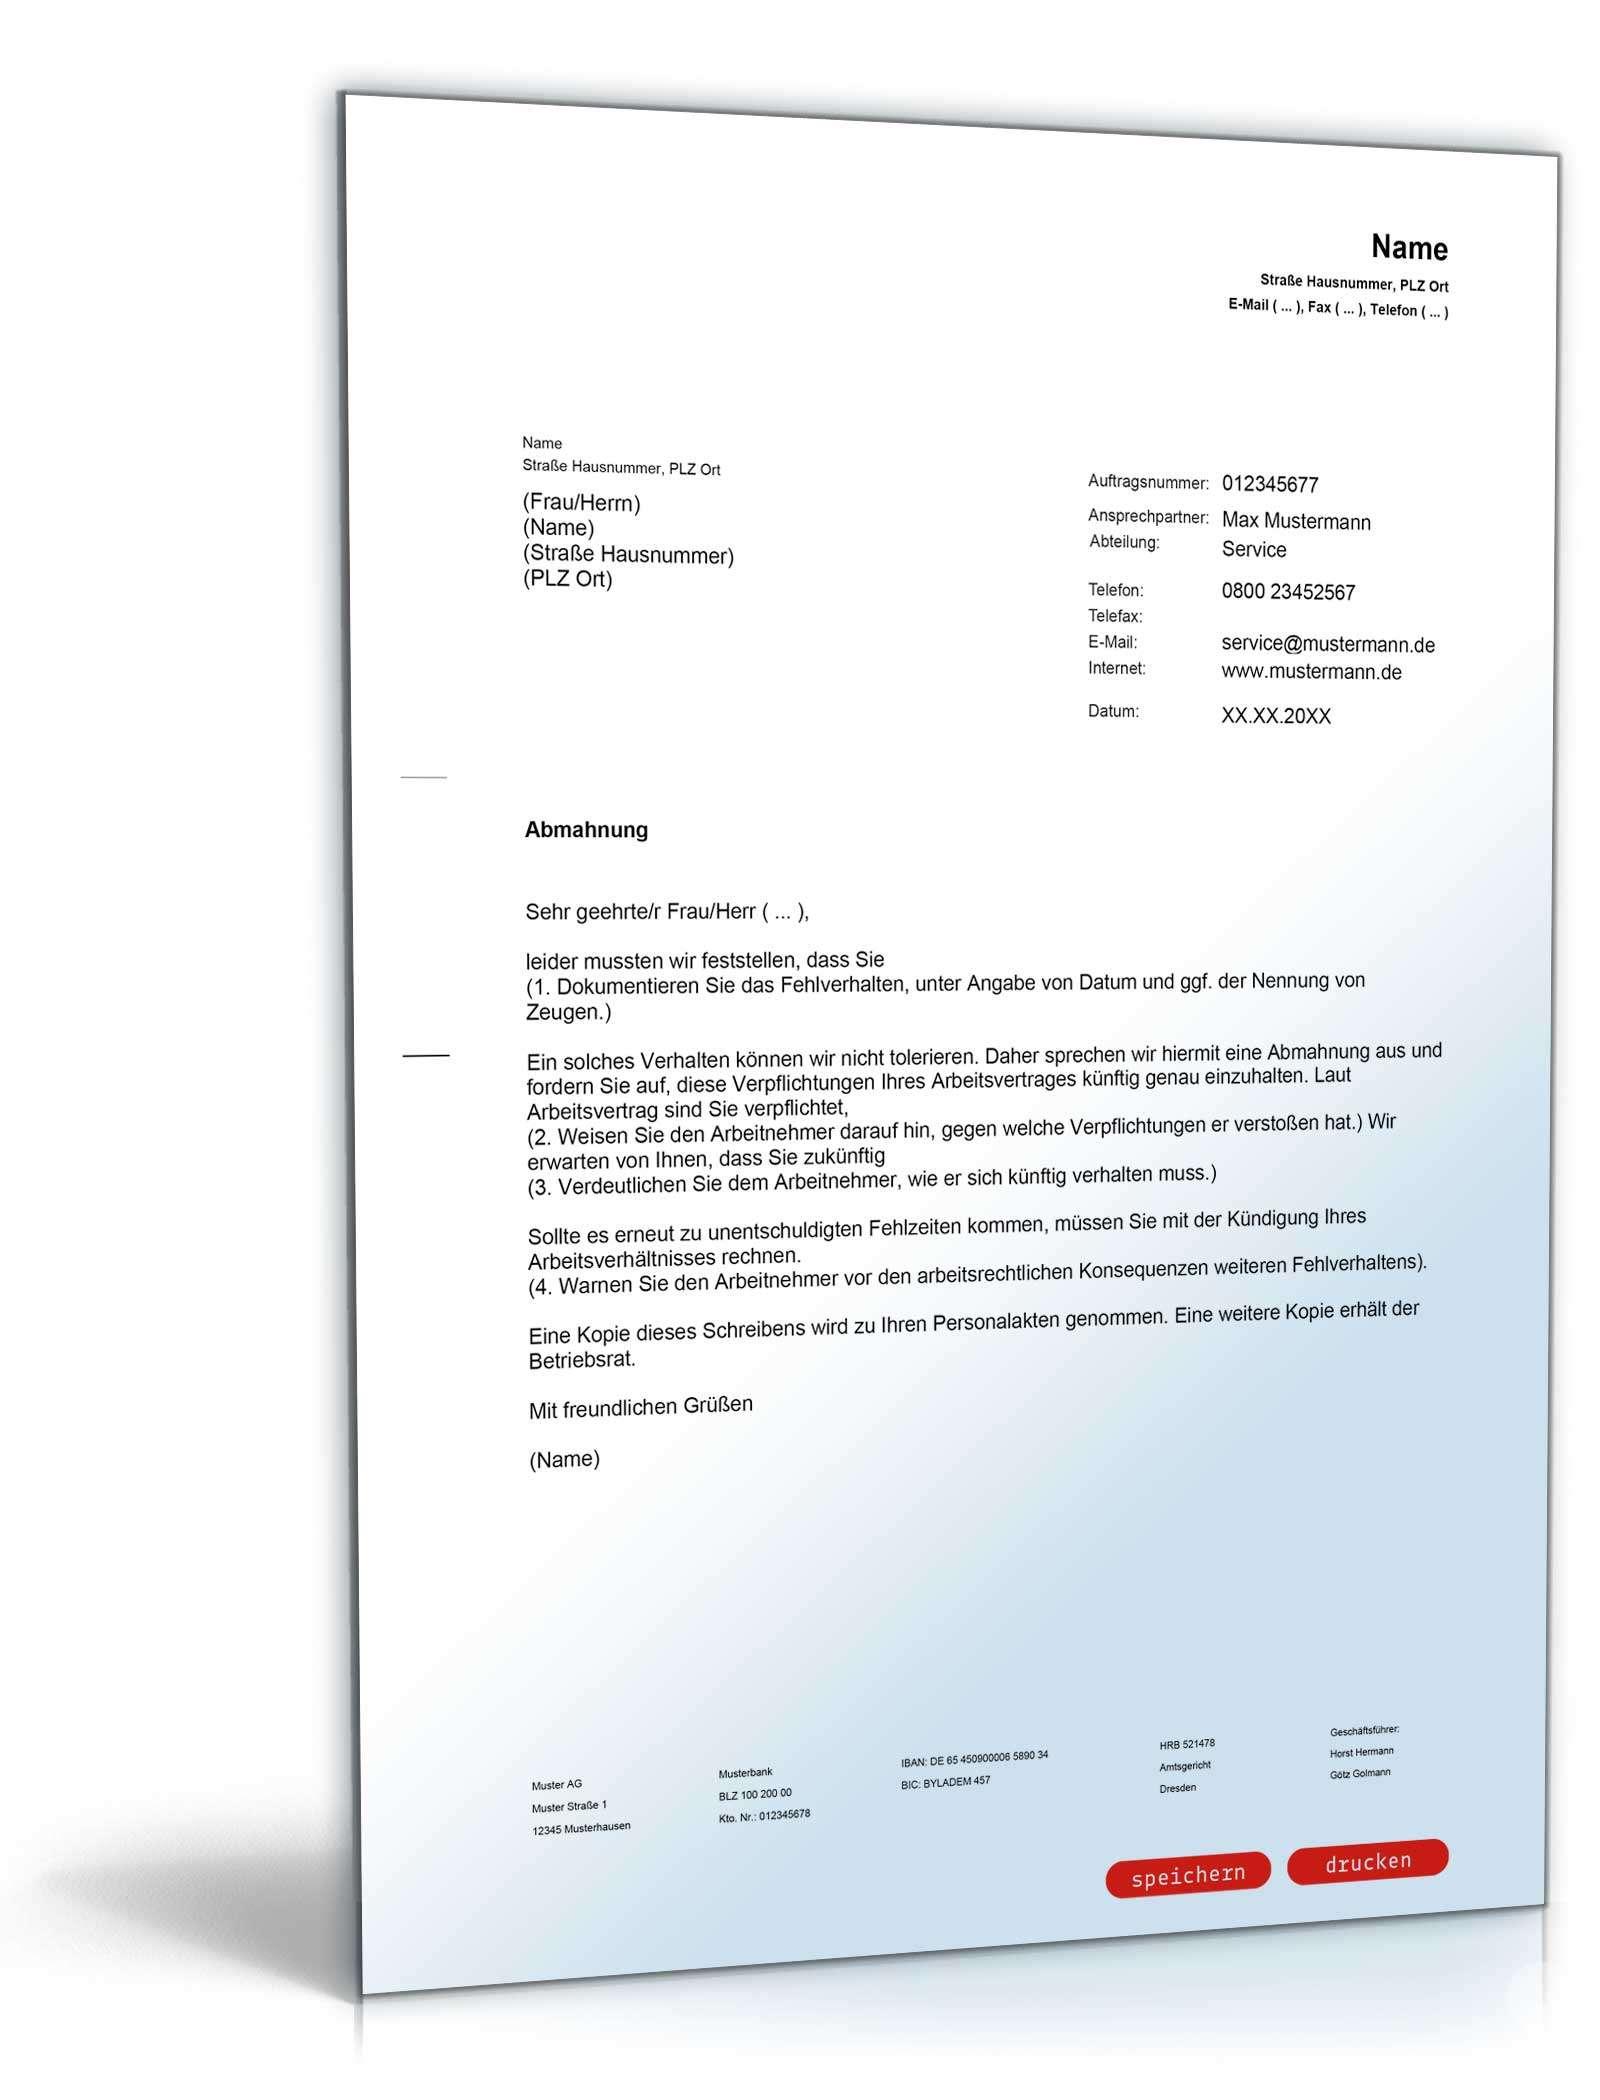 Musterbriefe Arbeitgeber : Abmahnung arbeitnehmer muster zum download